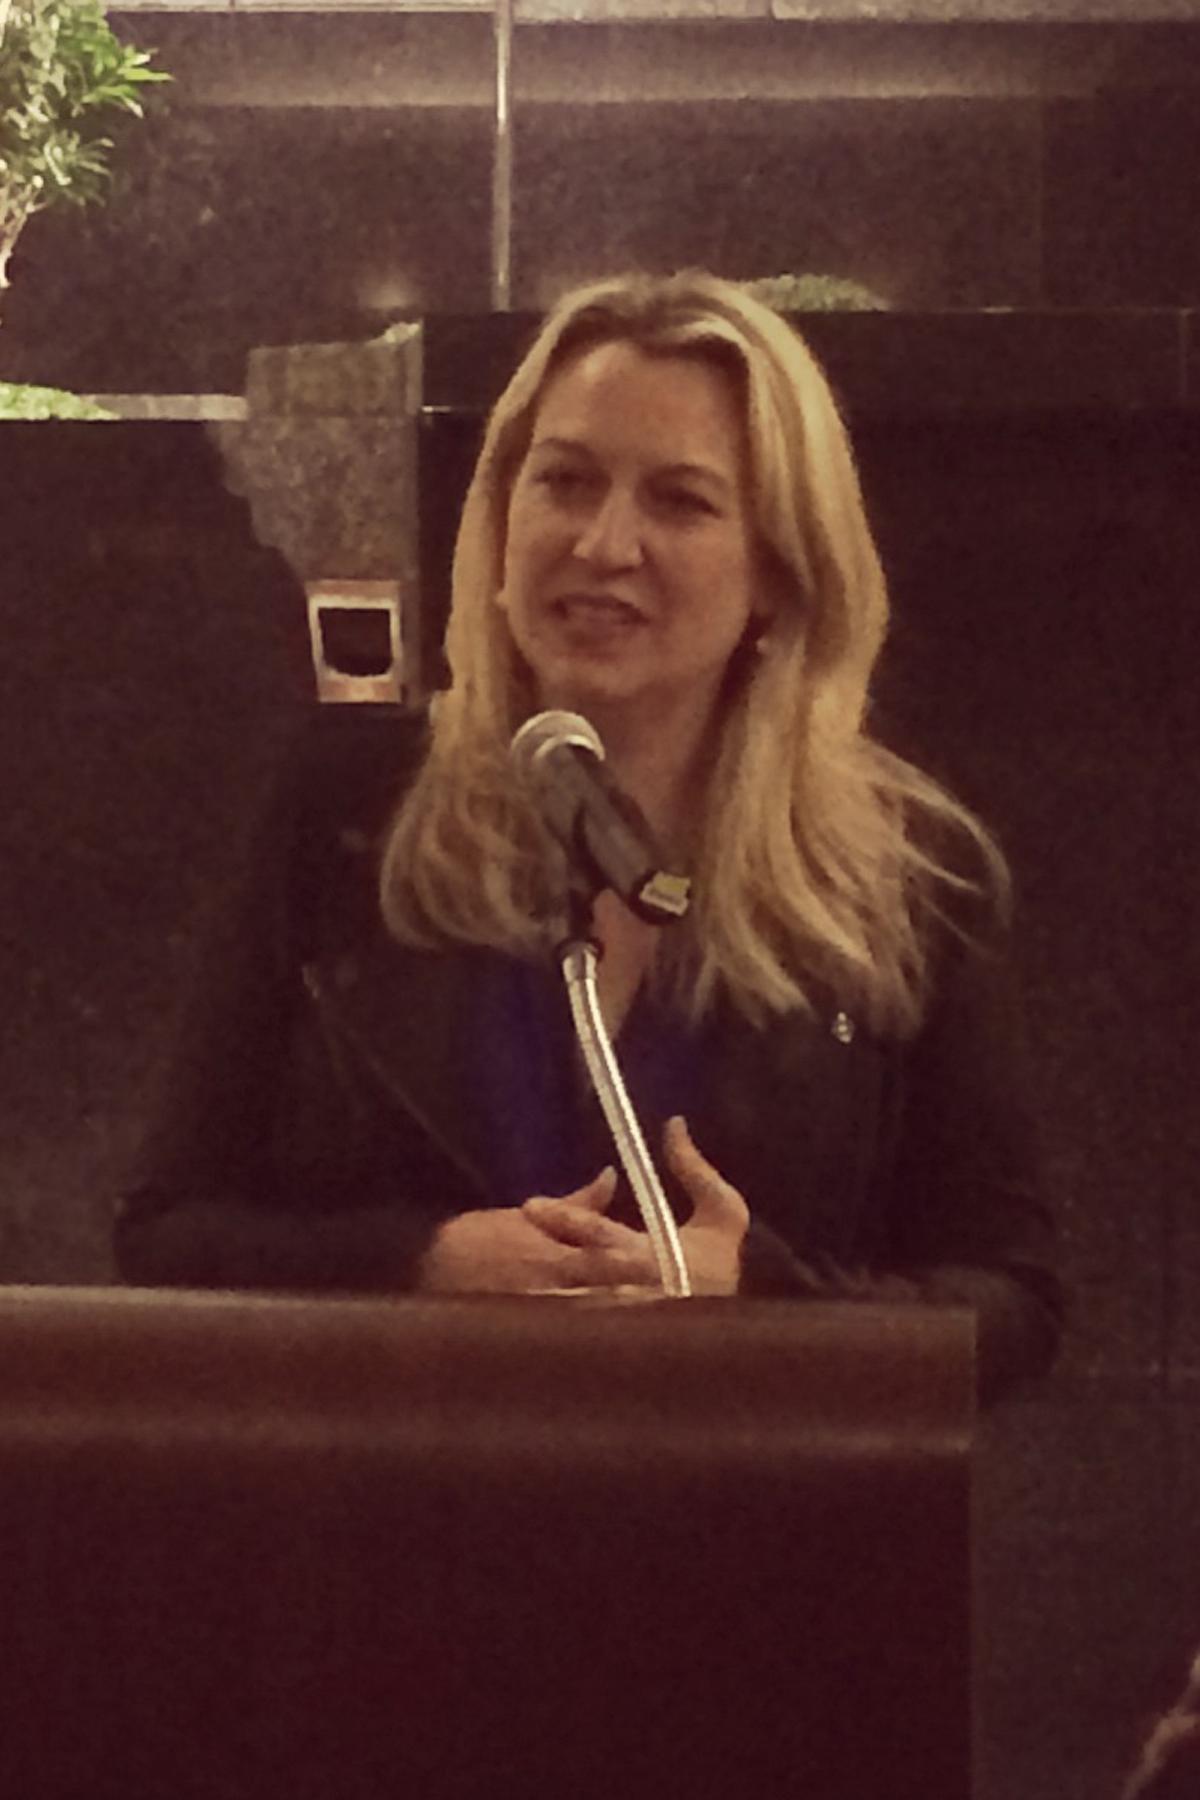 Dateline Minnesota: Emily Chenoweth reports from AWP